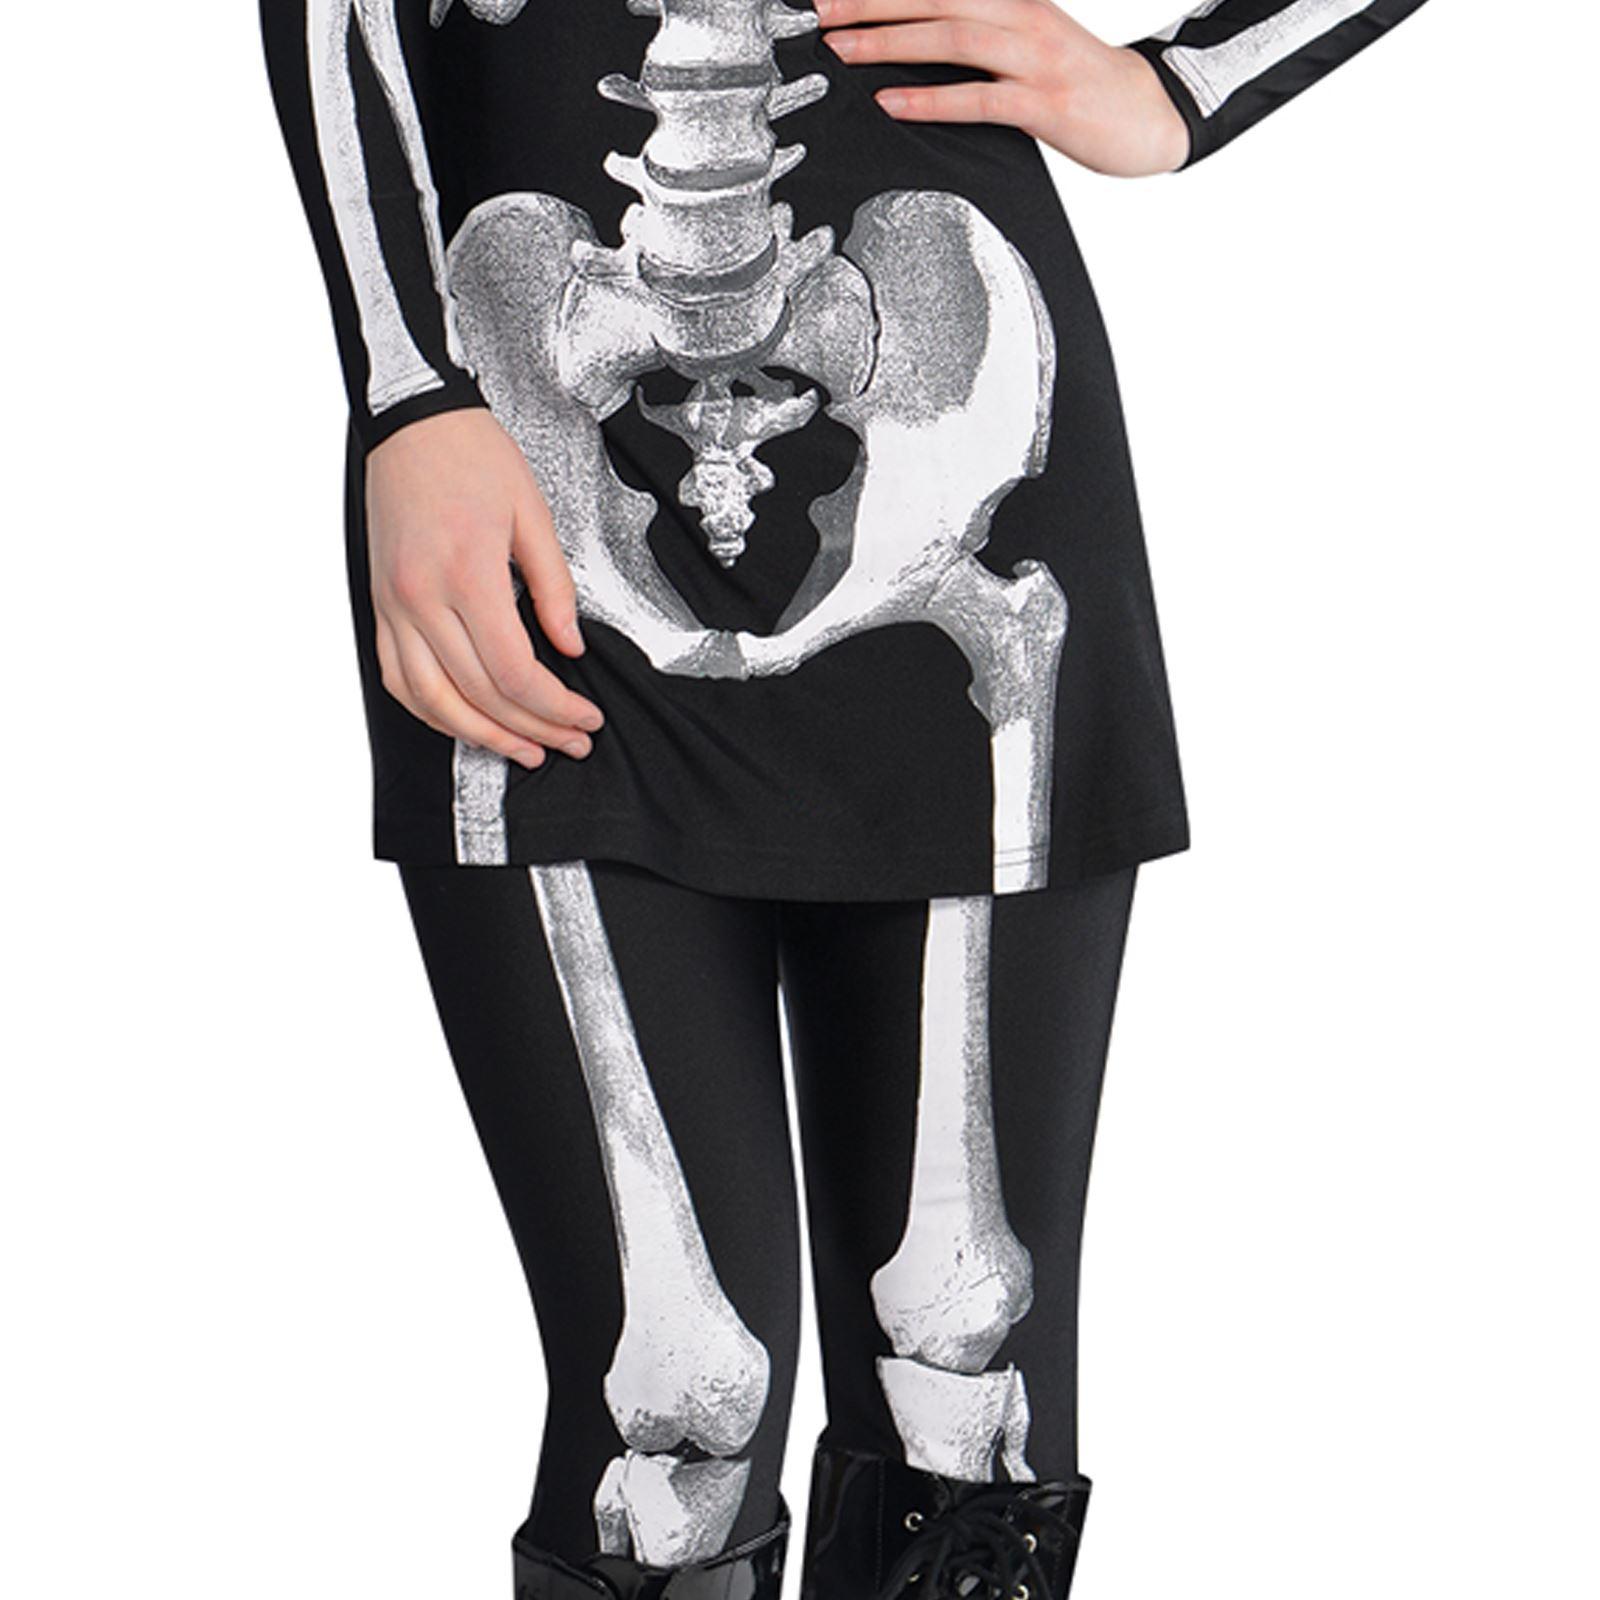 b0f324f4f2155 Adult Ladies Sexy Skeleton Bare Bones Gothic Halloween Costume Dress ...